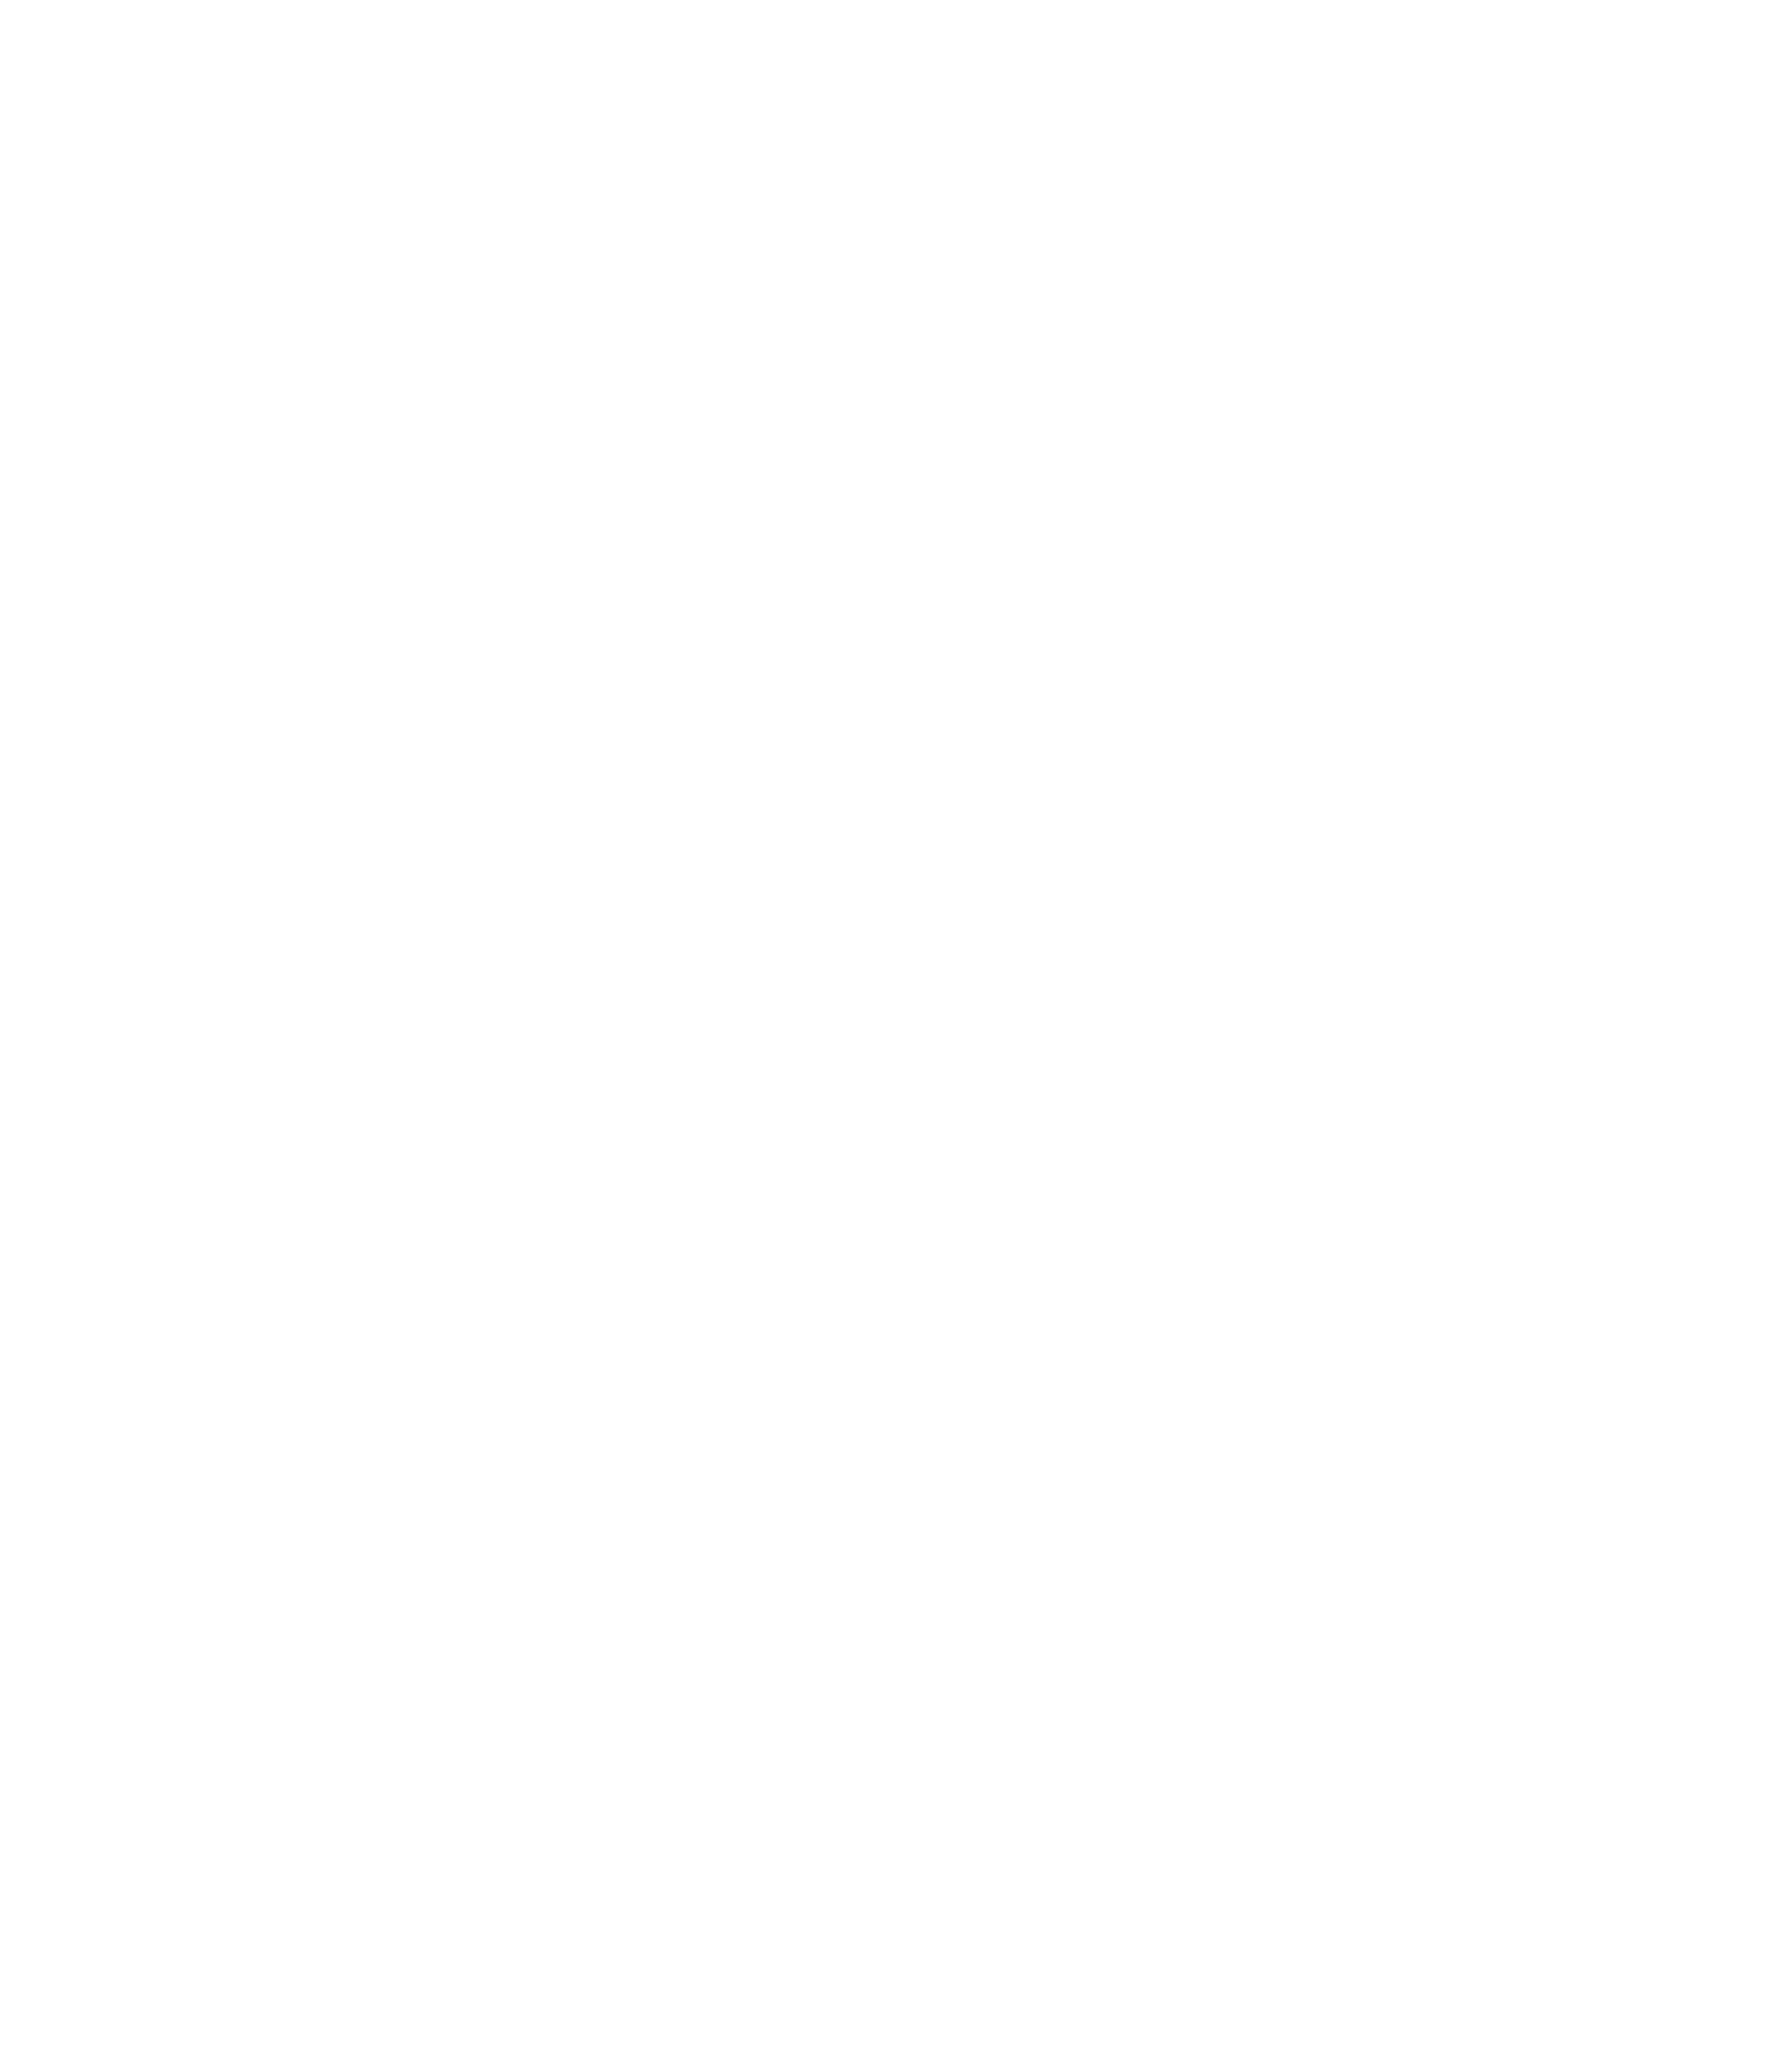 Allied-Waco-Stem-Cell